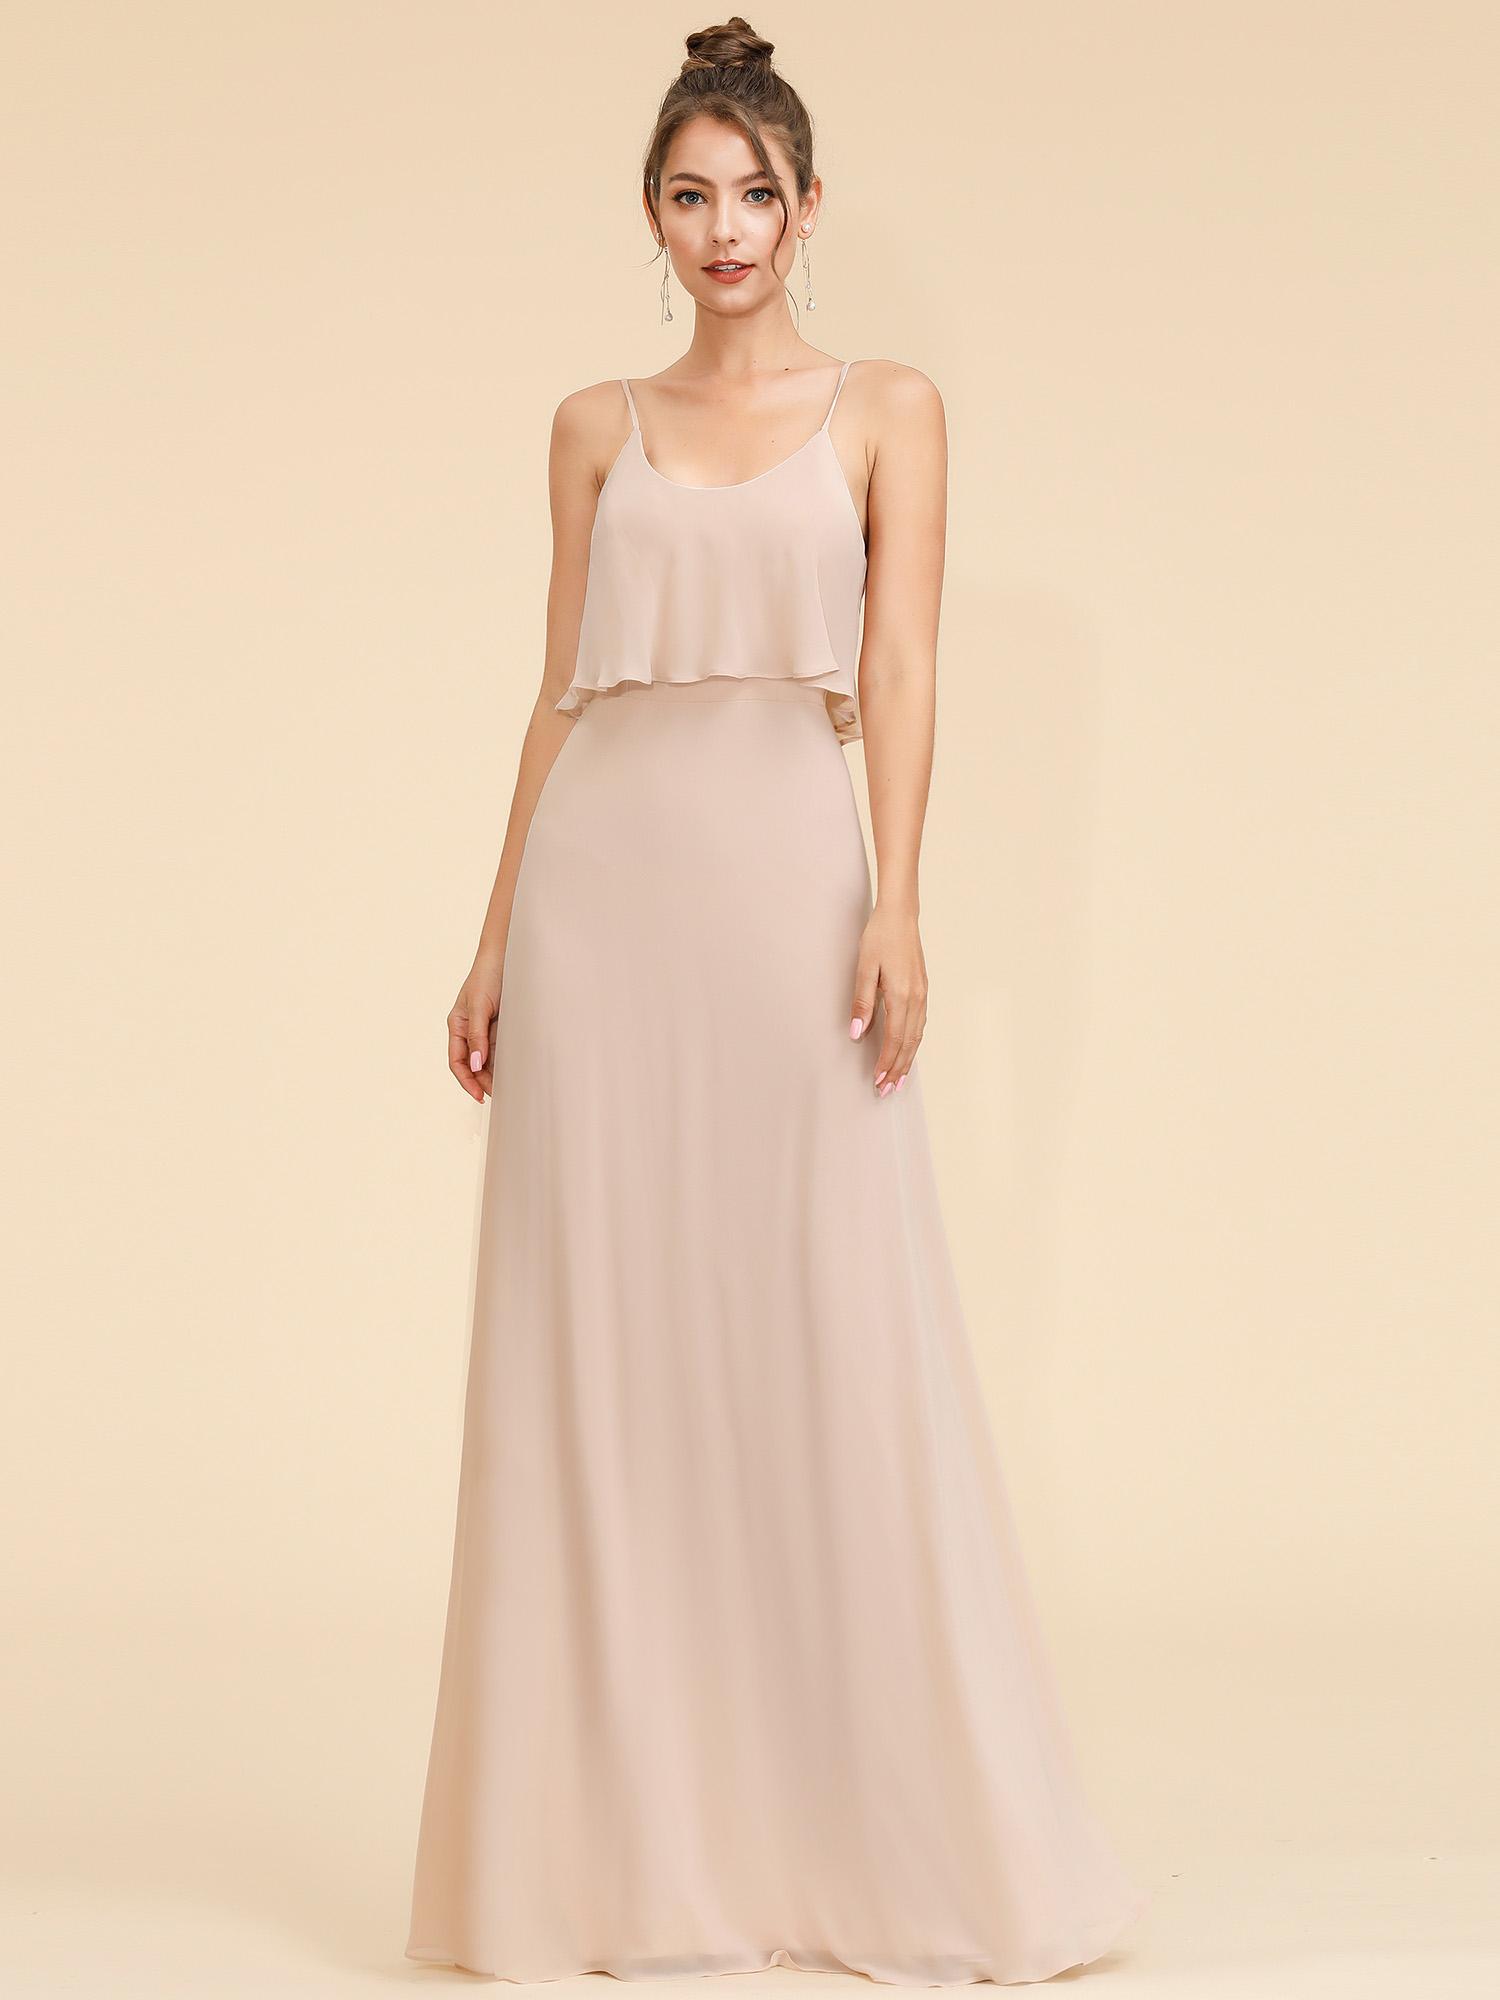 Ever-Pretty Long Elegant Gallus Formal Evening Wedding Formal Party Dress 07131